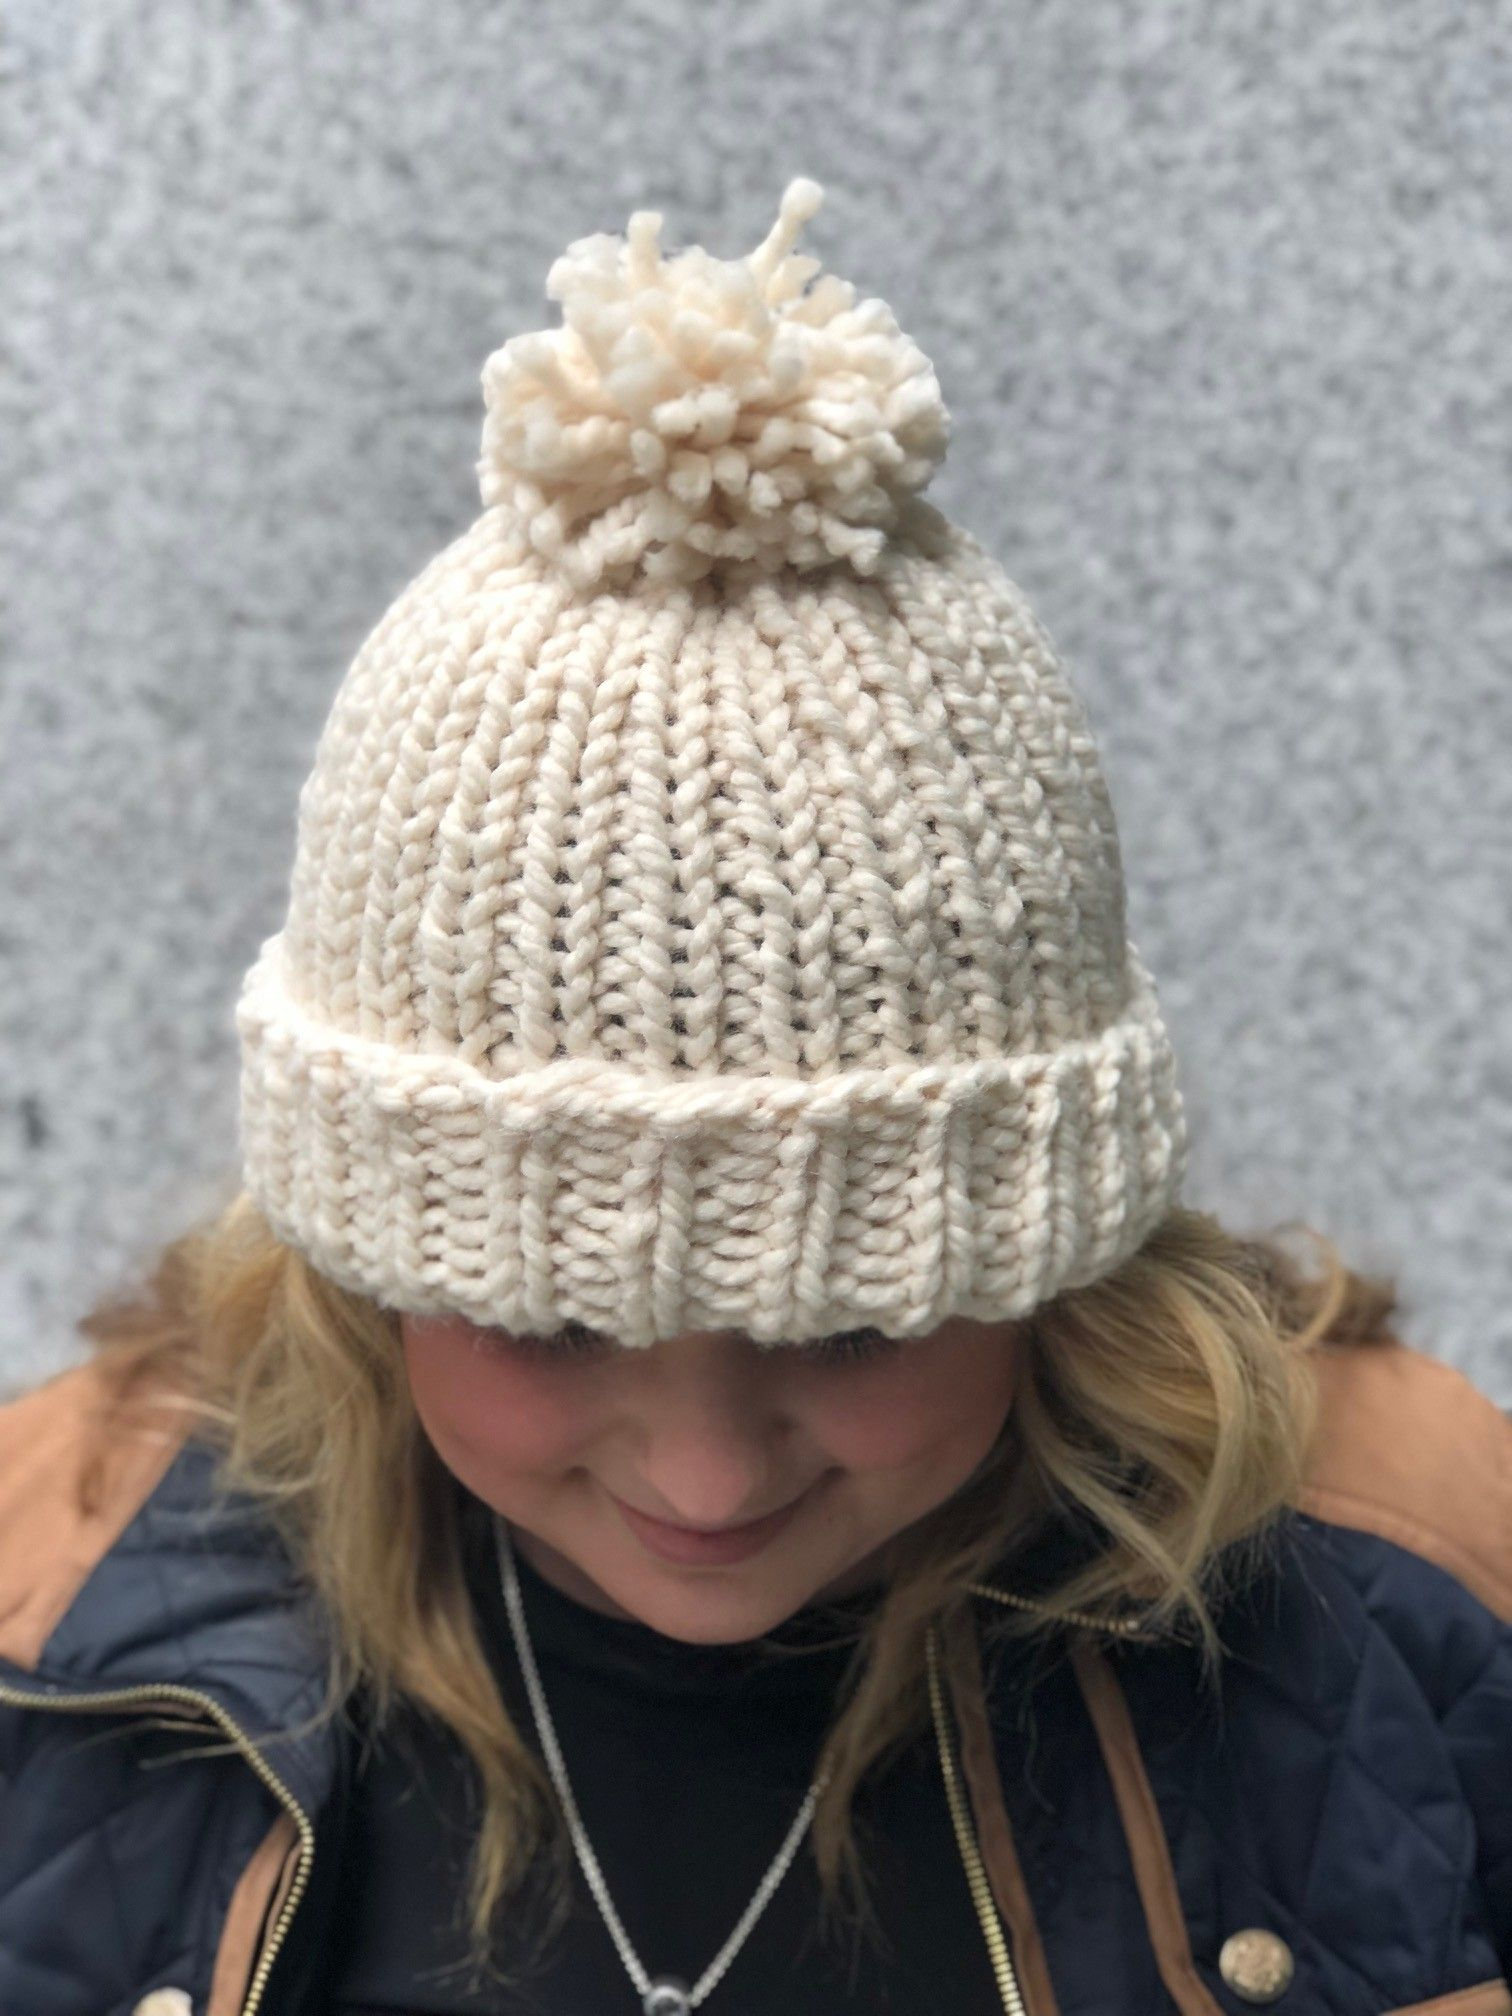 Gold Medal Knit Hat - Chloe Kim hat  68819c8659f